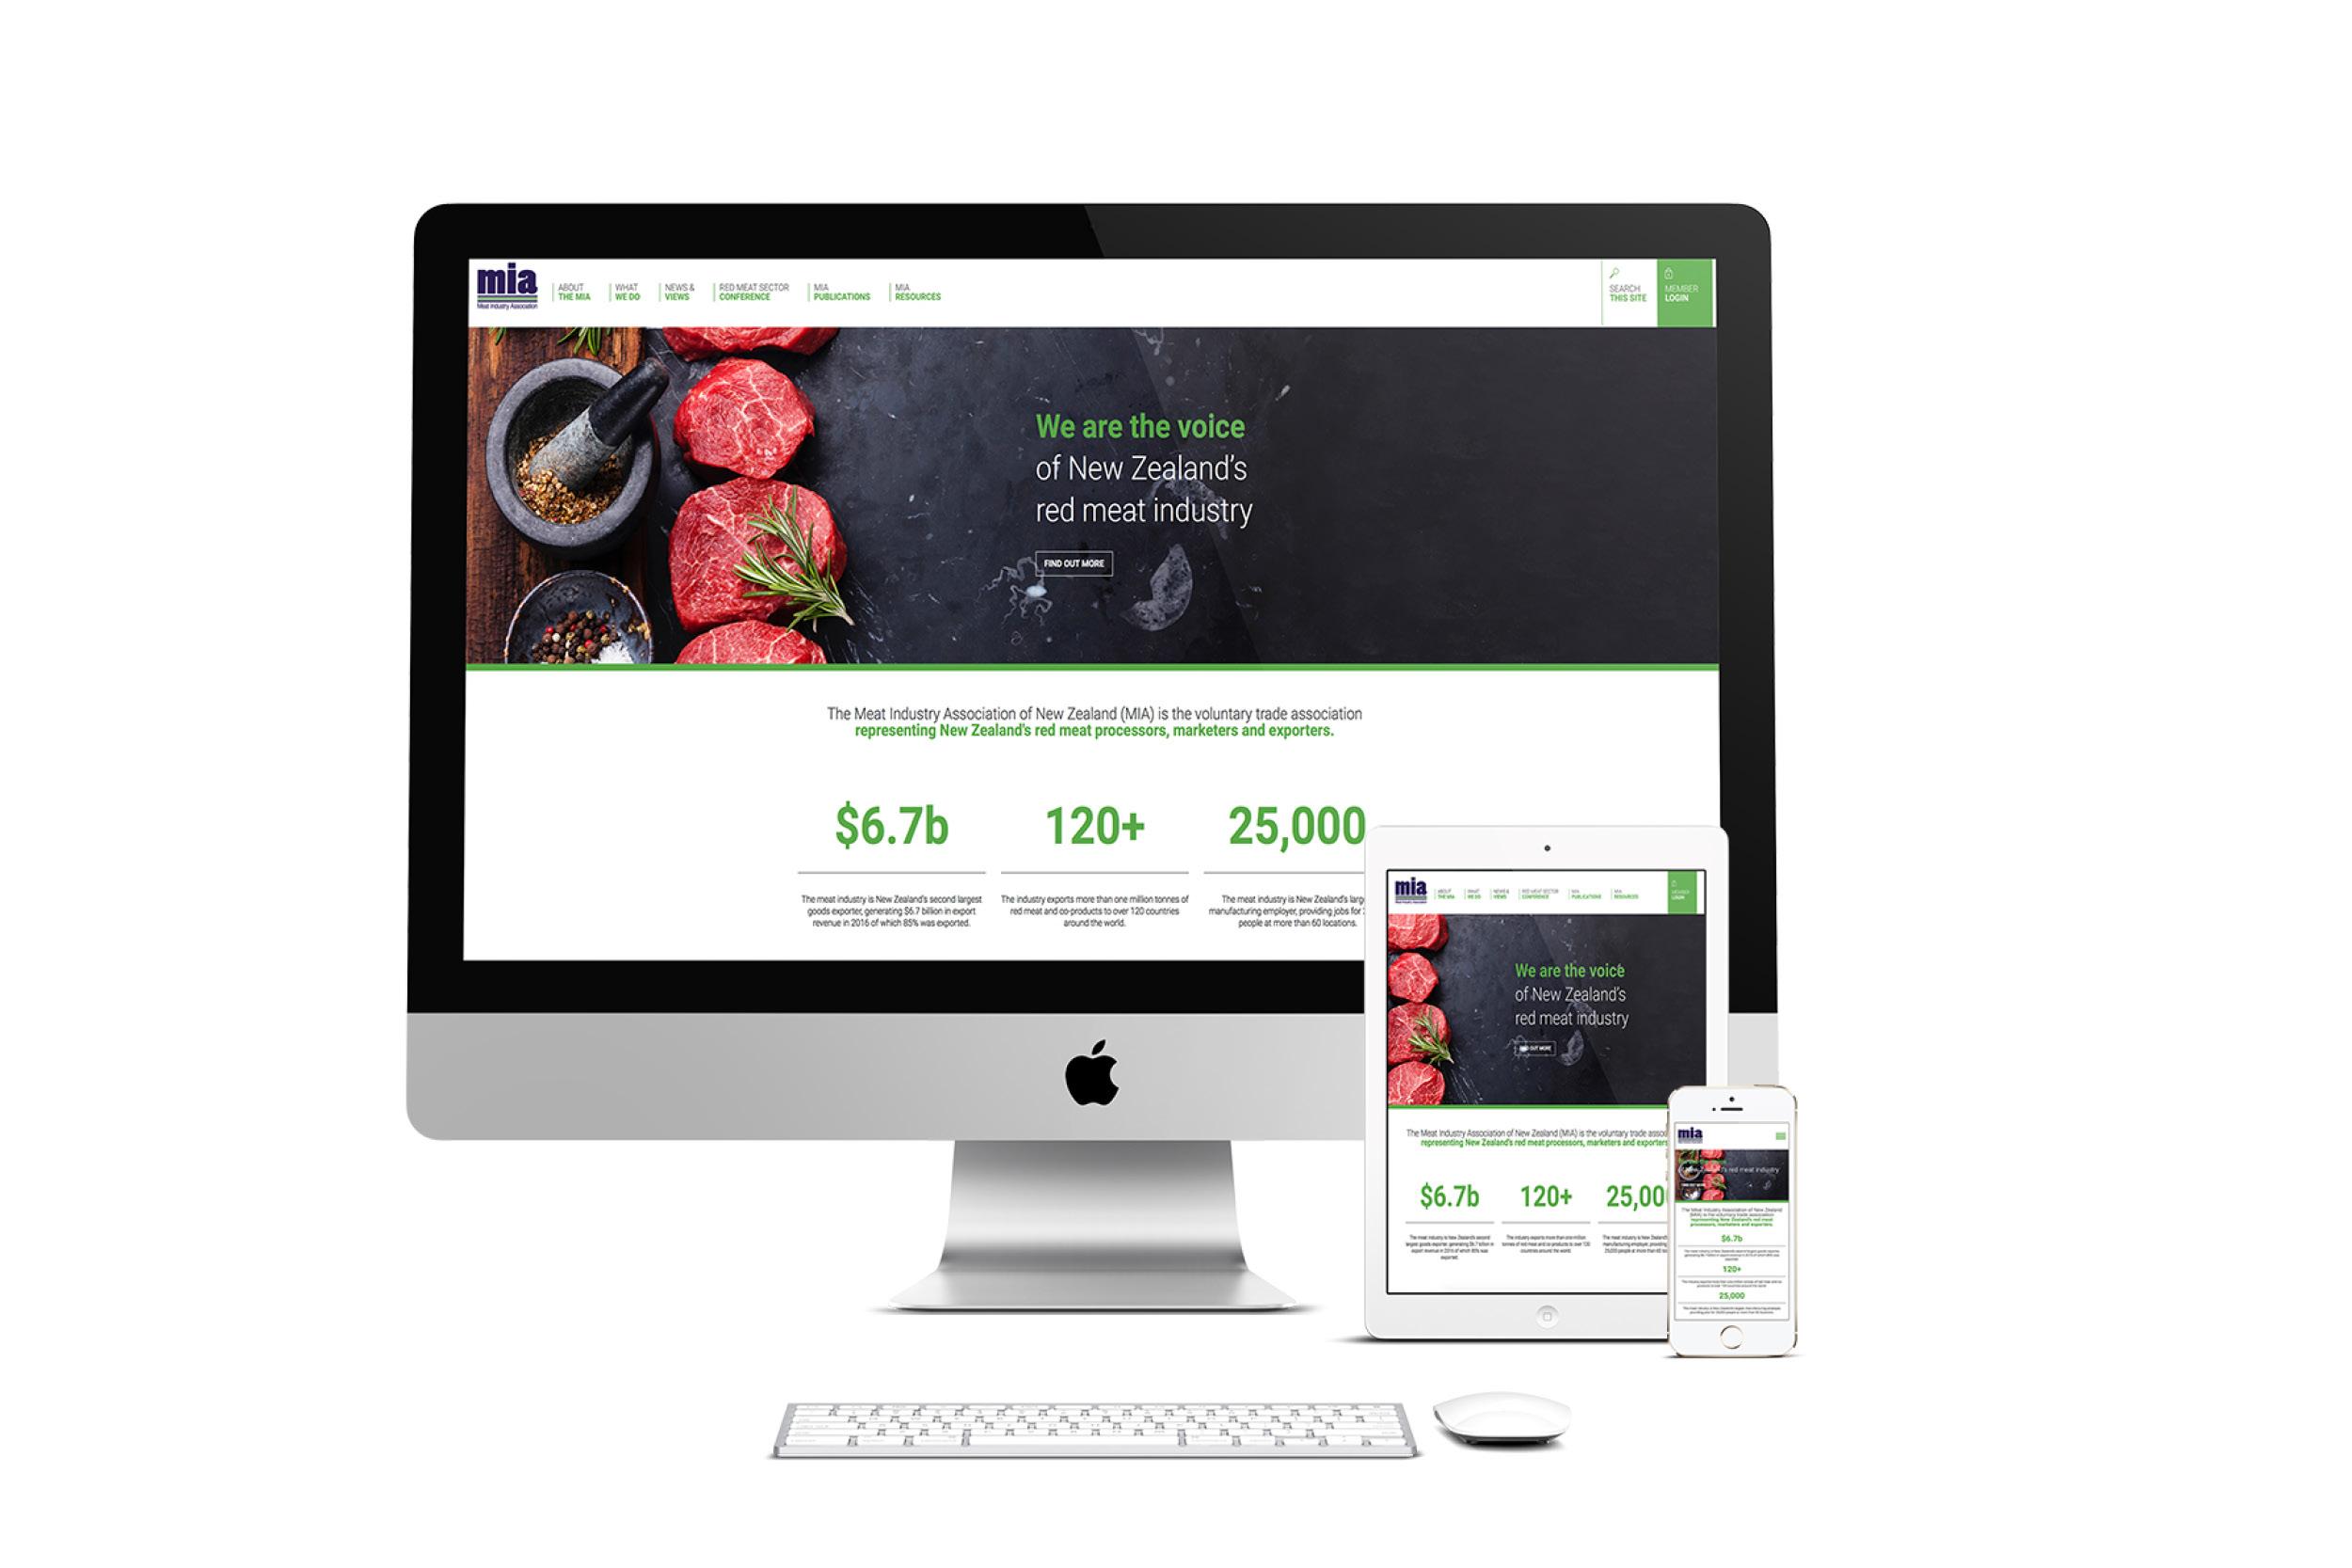 Meat Industry AssociationWebsite